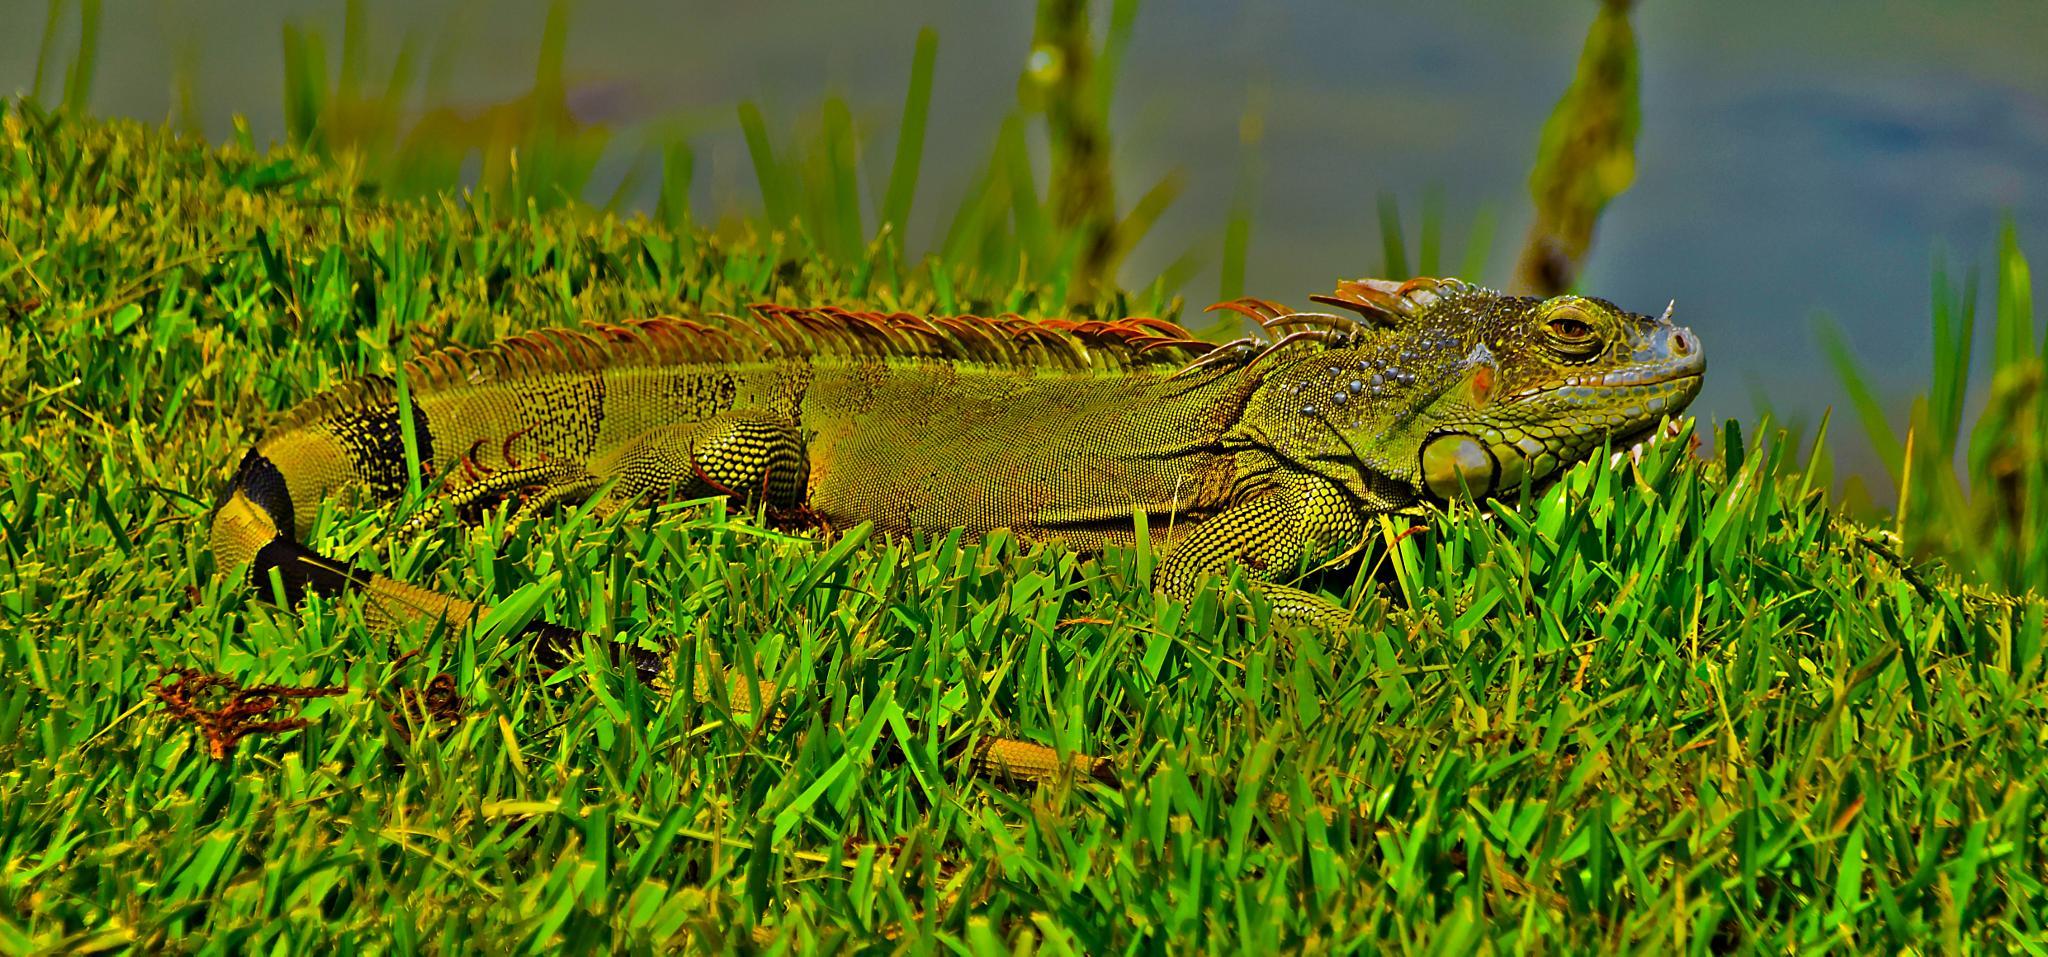 Male Iguana by Sophia von Wrangell